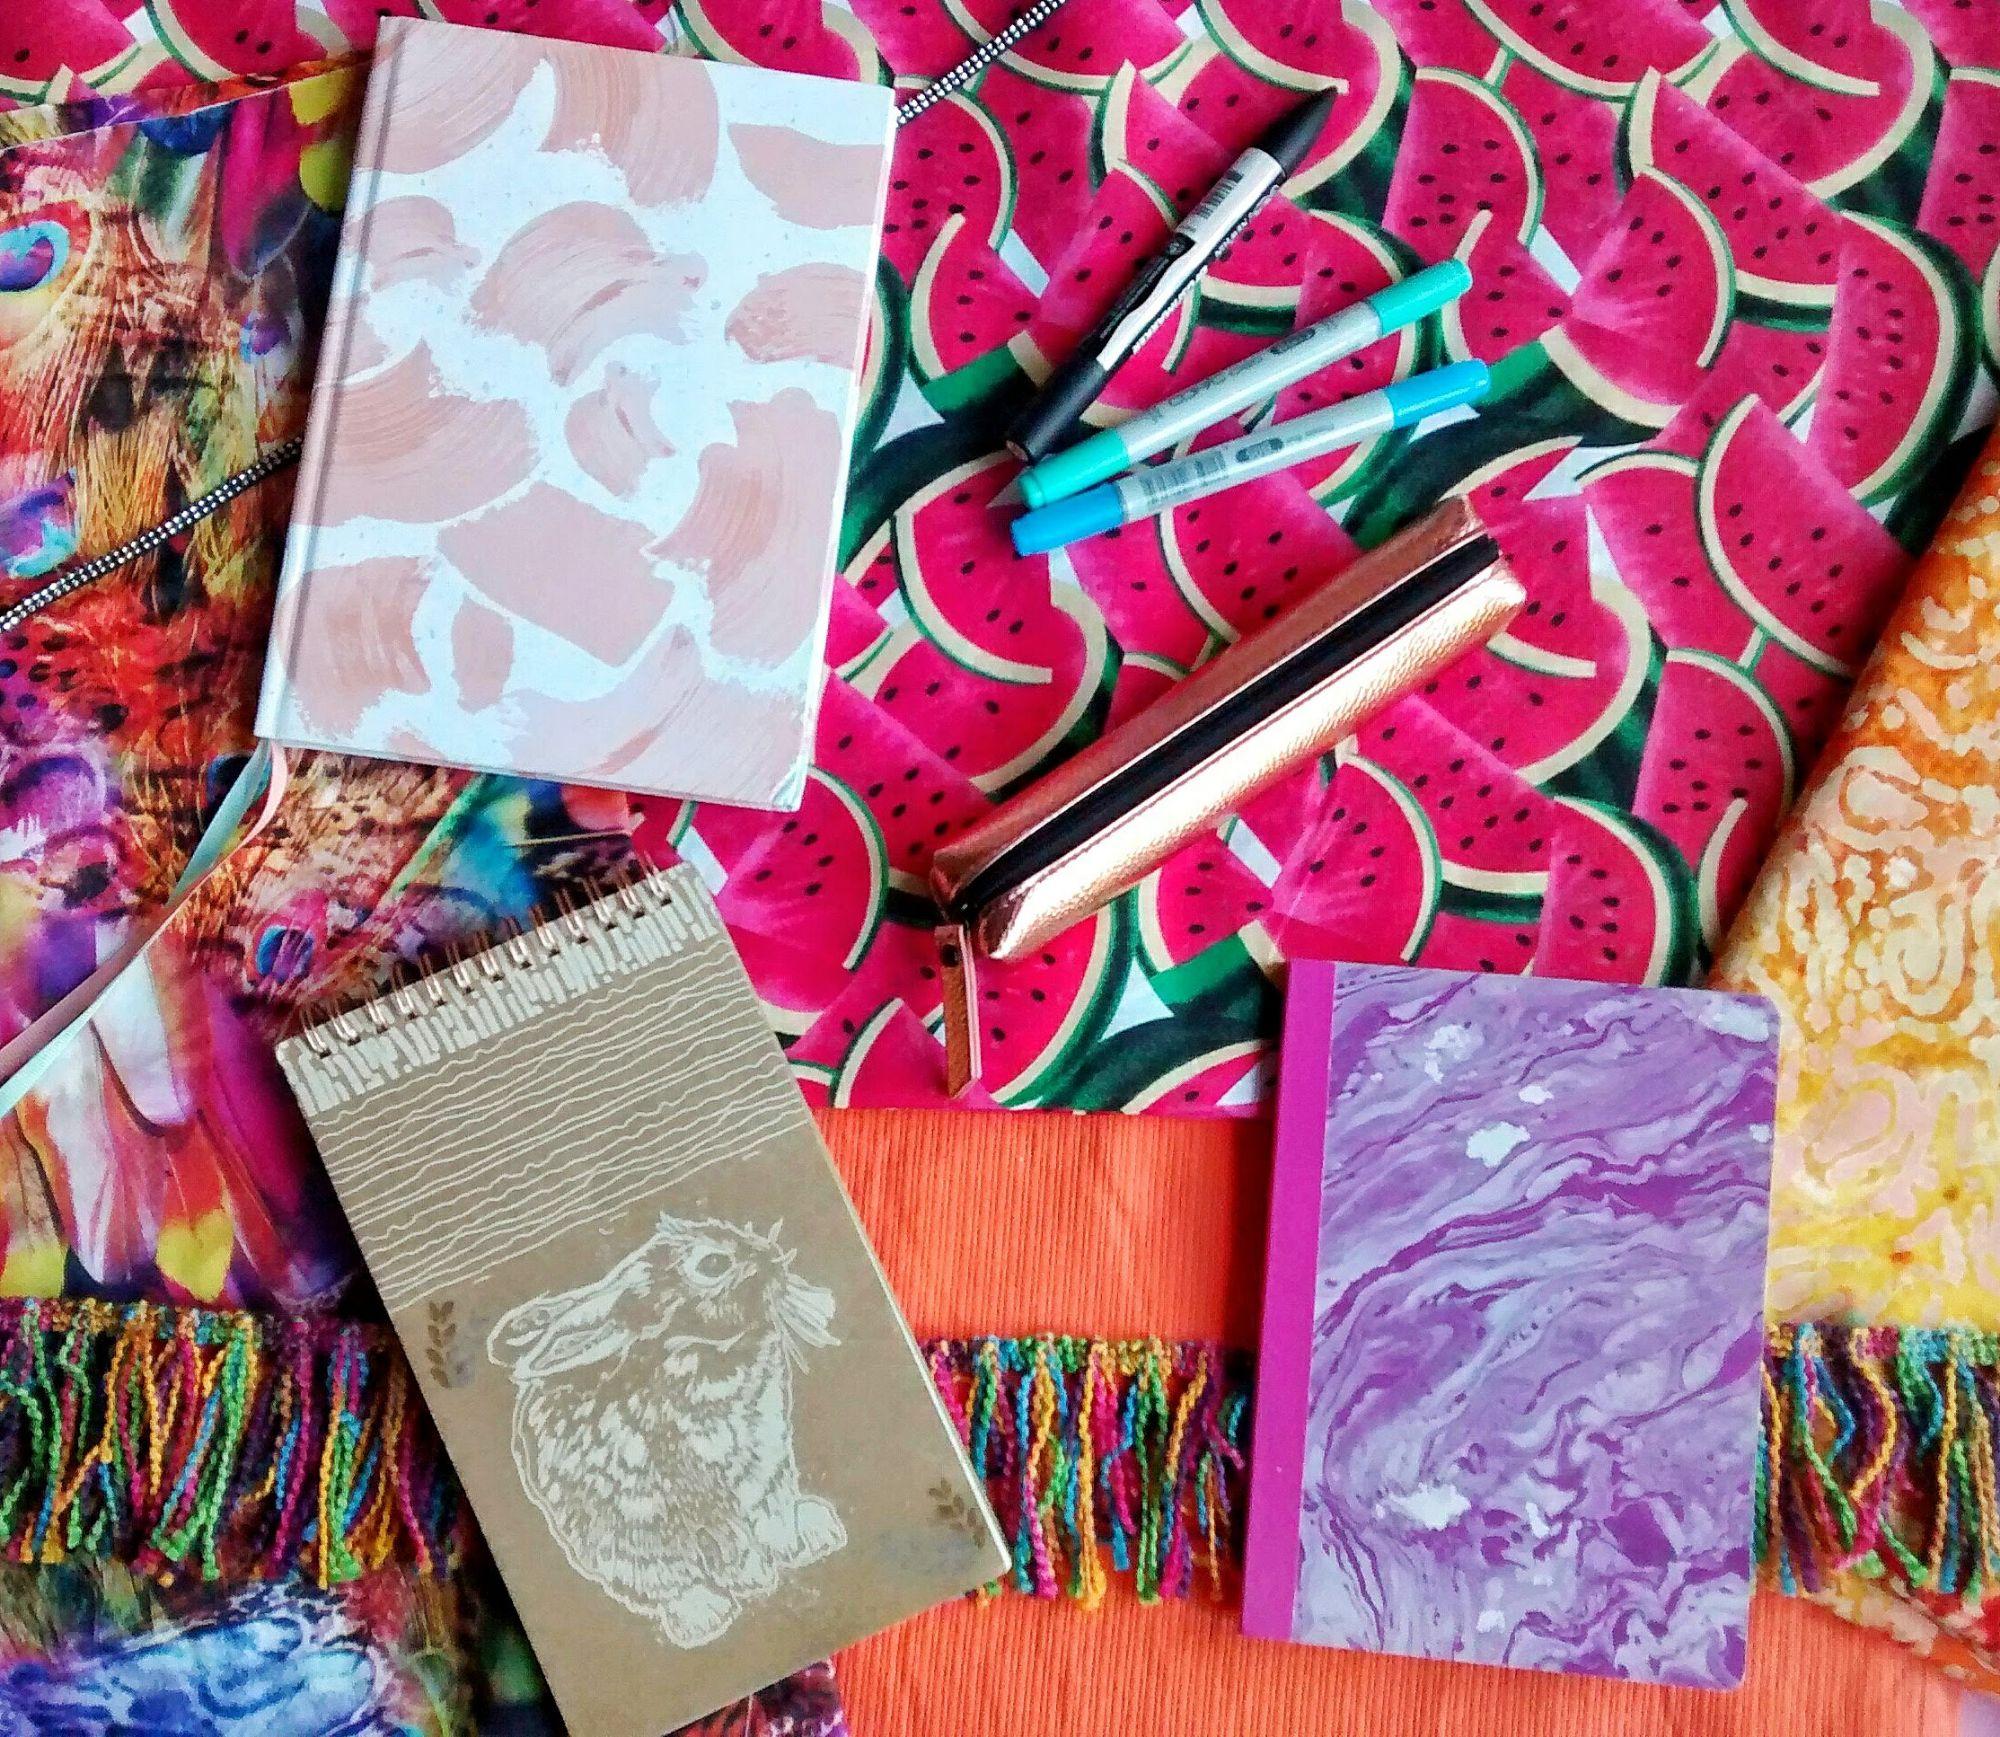 Brightly coloured fabrics and stationery Raspberrycatdesigns.co.uk